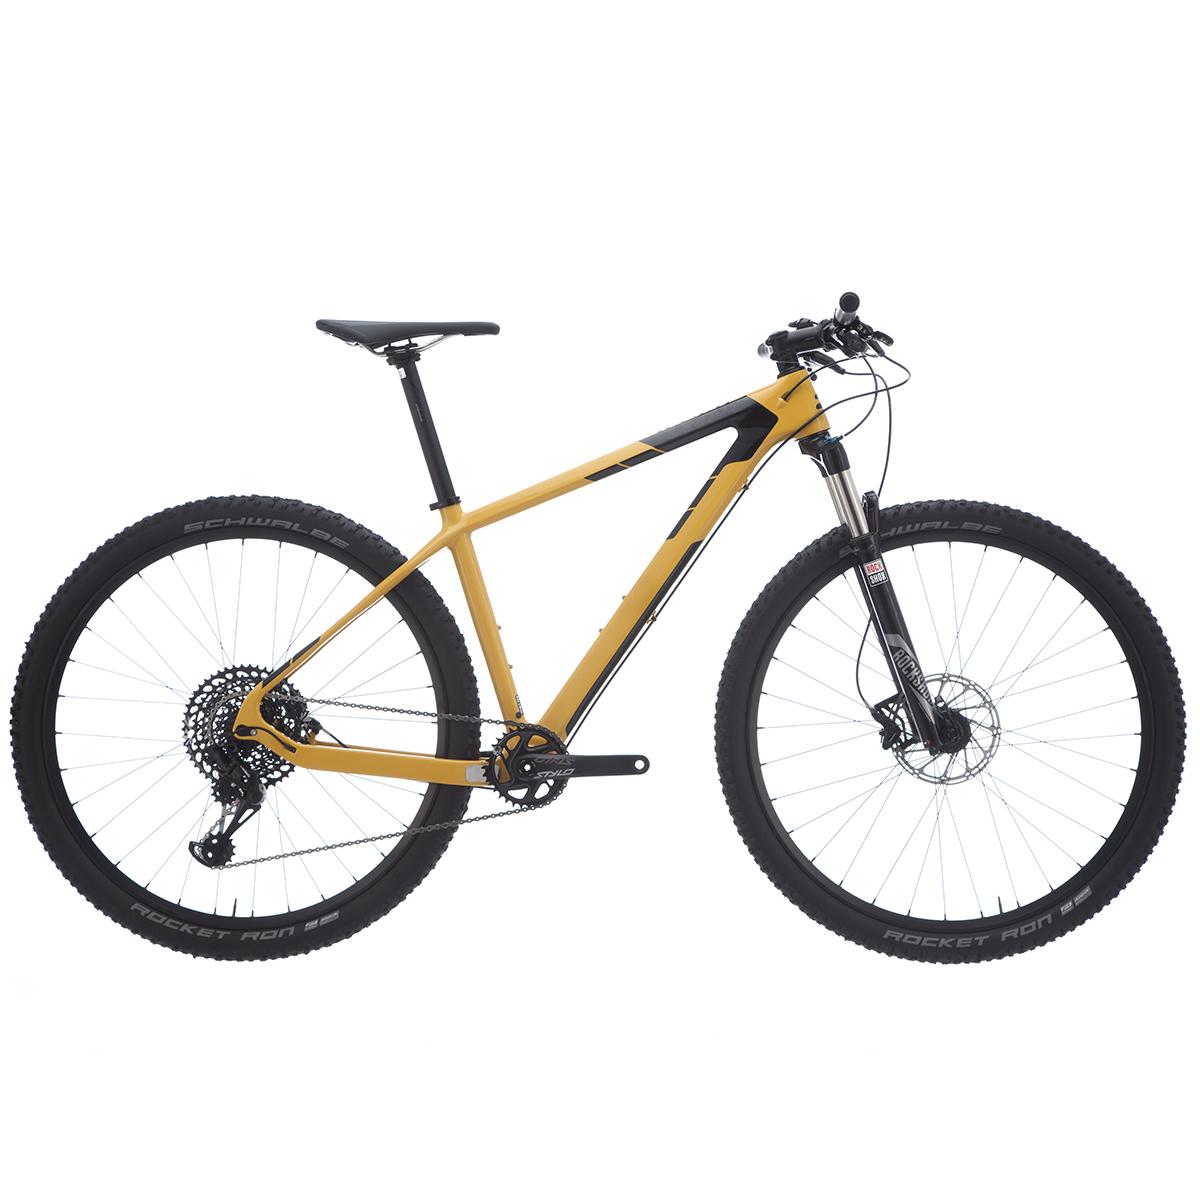 Ridley Ignite C9 Deore Carbon Mountain Bike